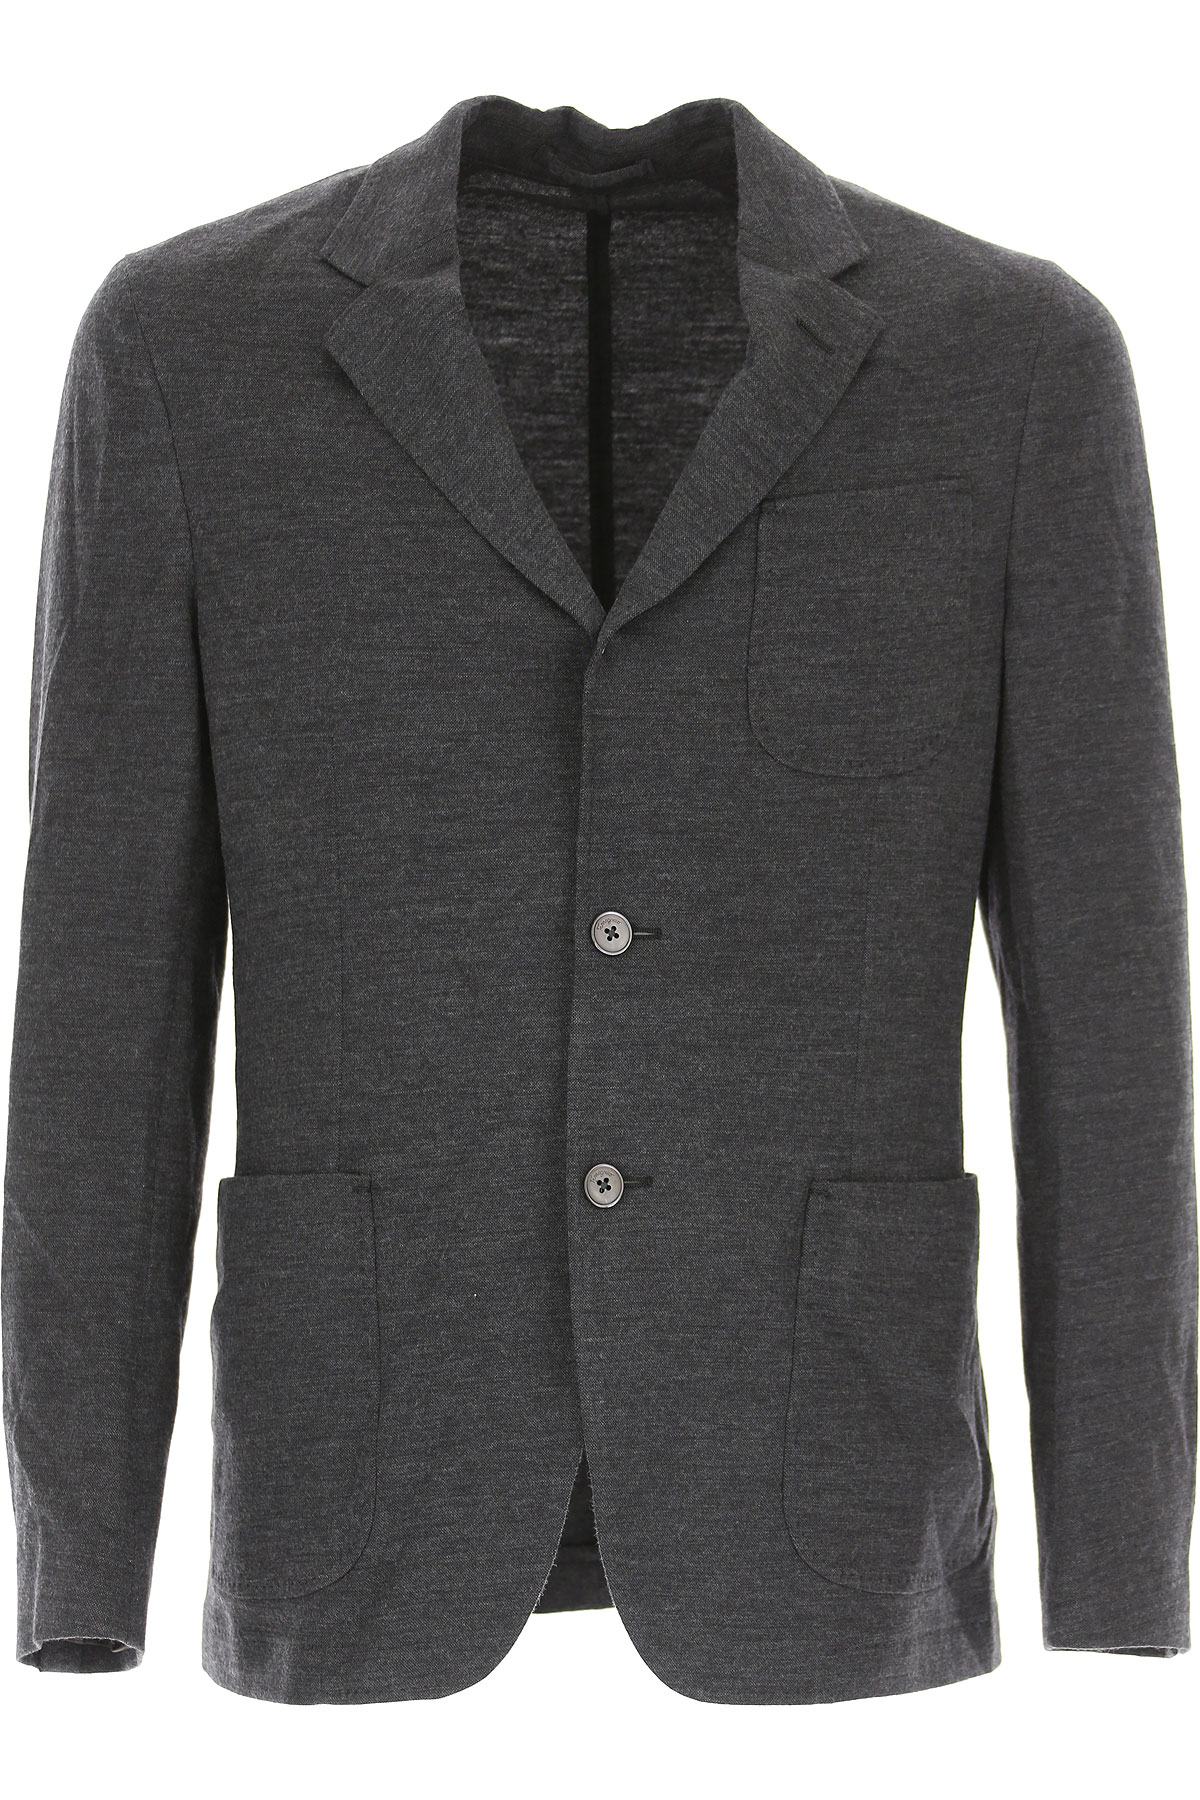 Image of Salvatore Ferragamo Blazer for Men, Sport Coat, antracite, Virgin wool, 2017, L M XL